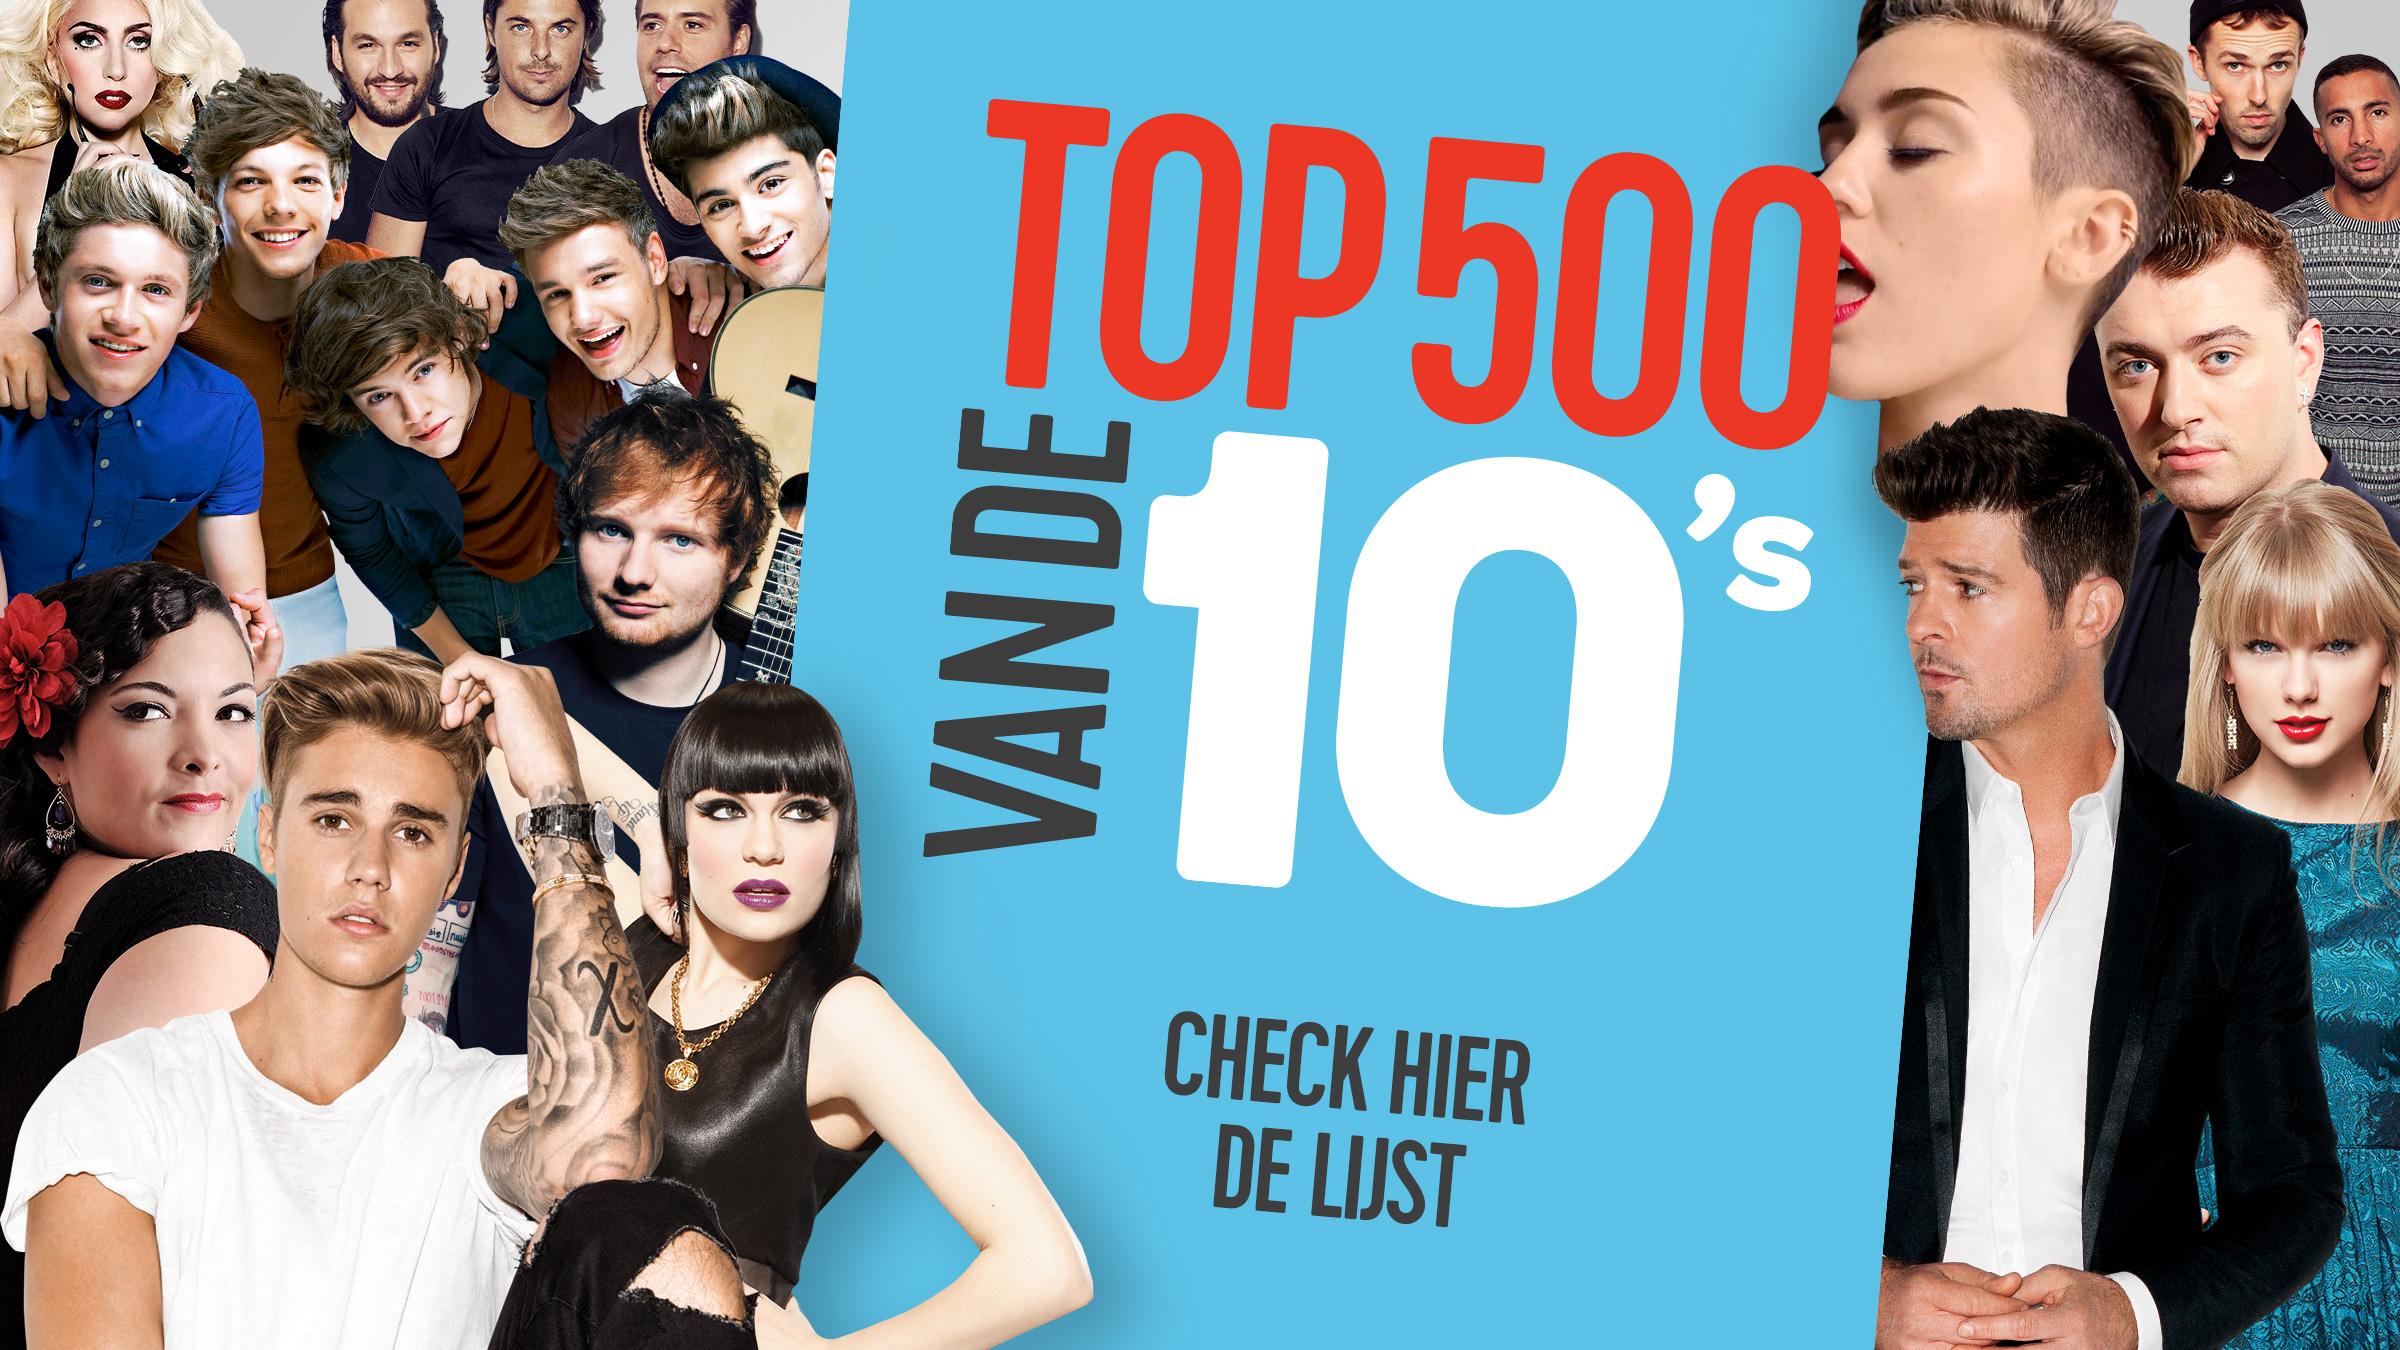 Qmusic teaser top500 10s check